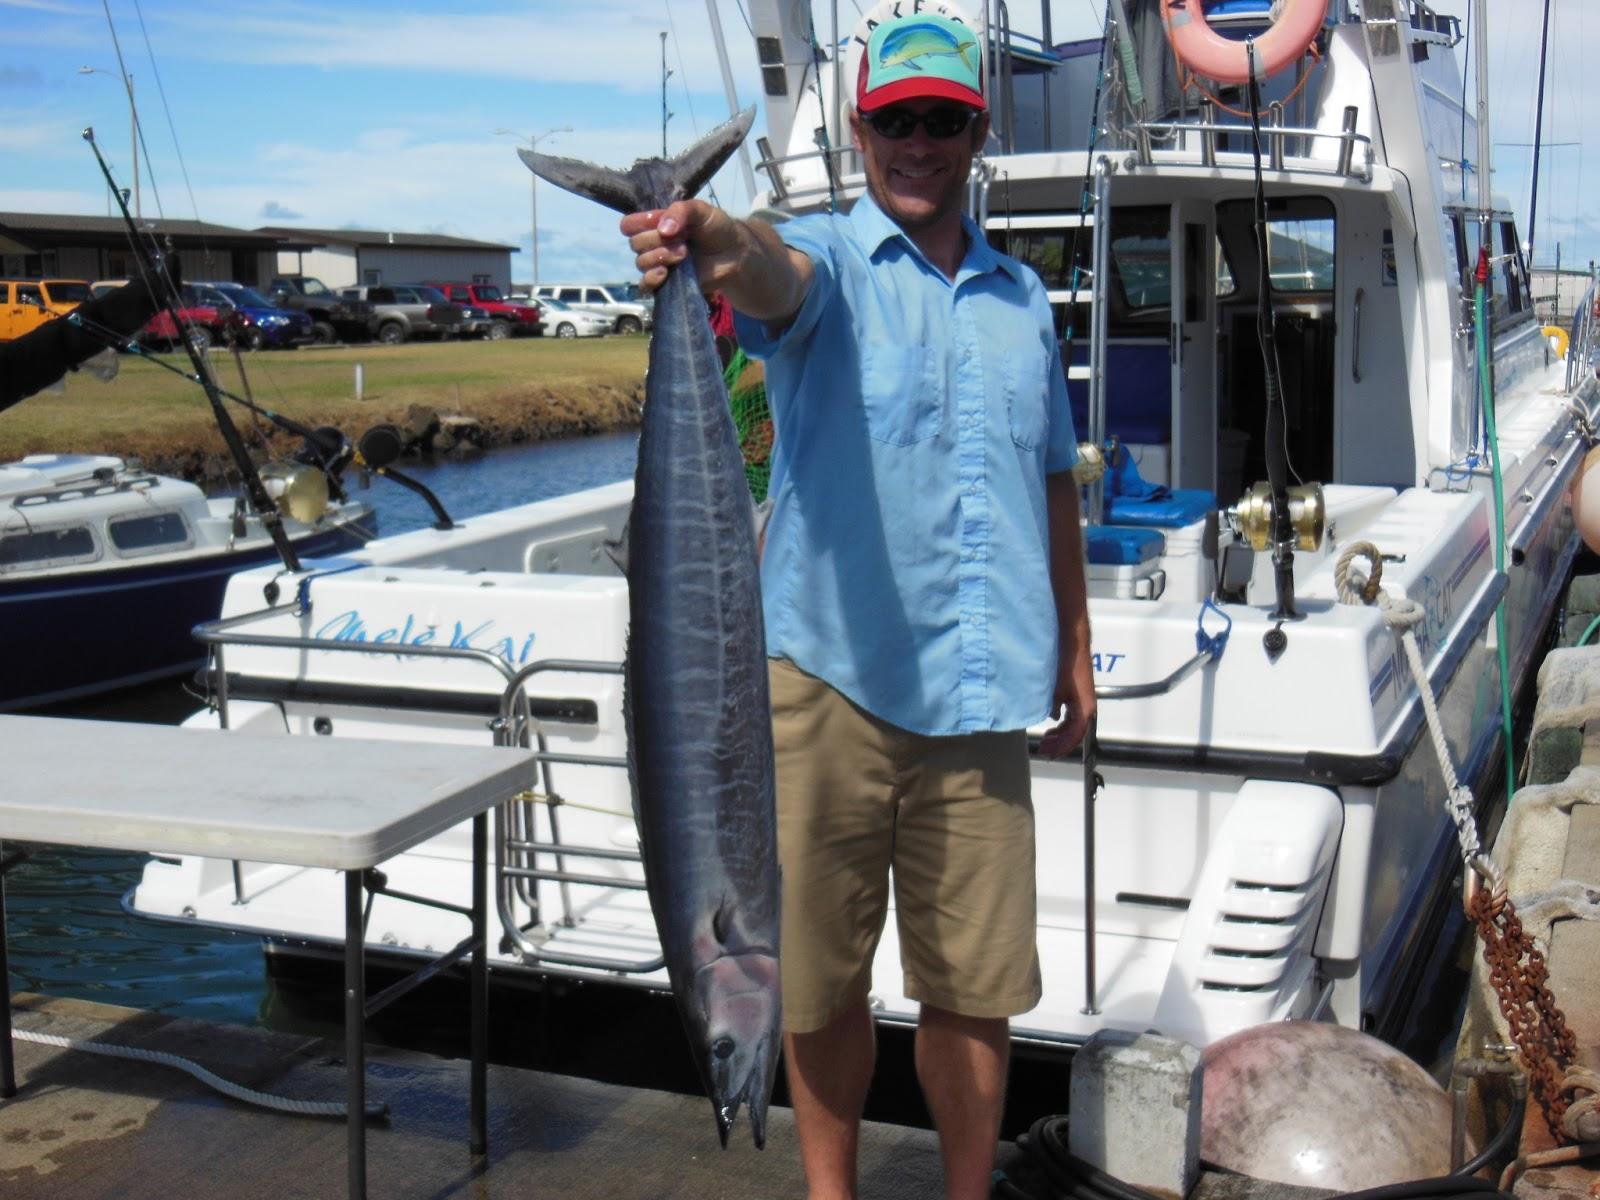 C lure fishing chaters kauai hawaii wahoo hawaii for Fishing in kauai